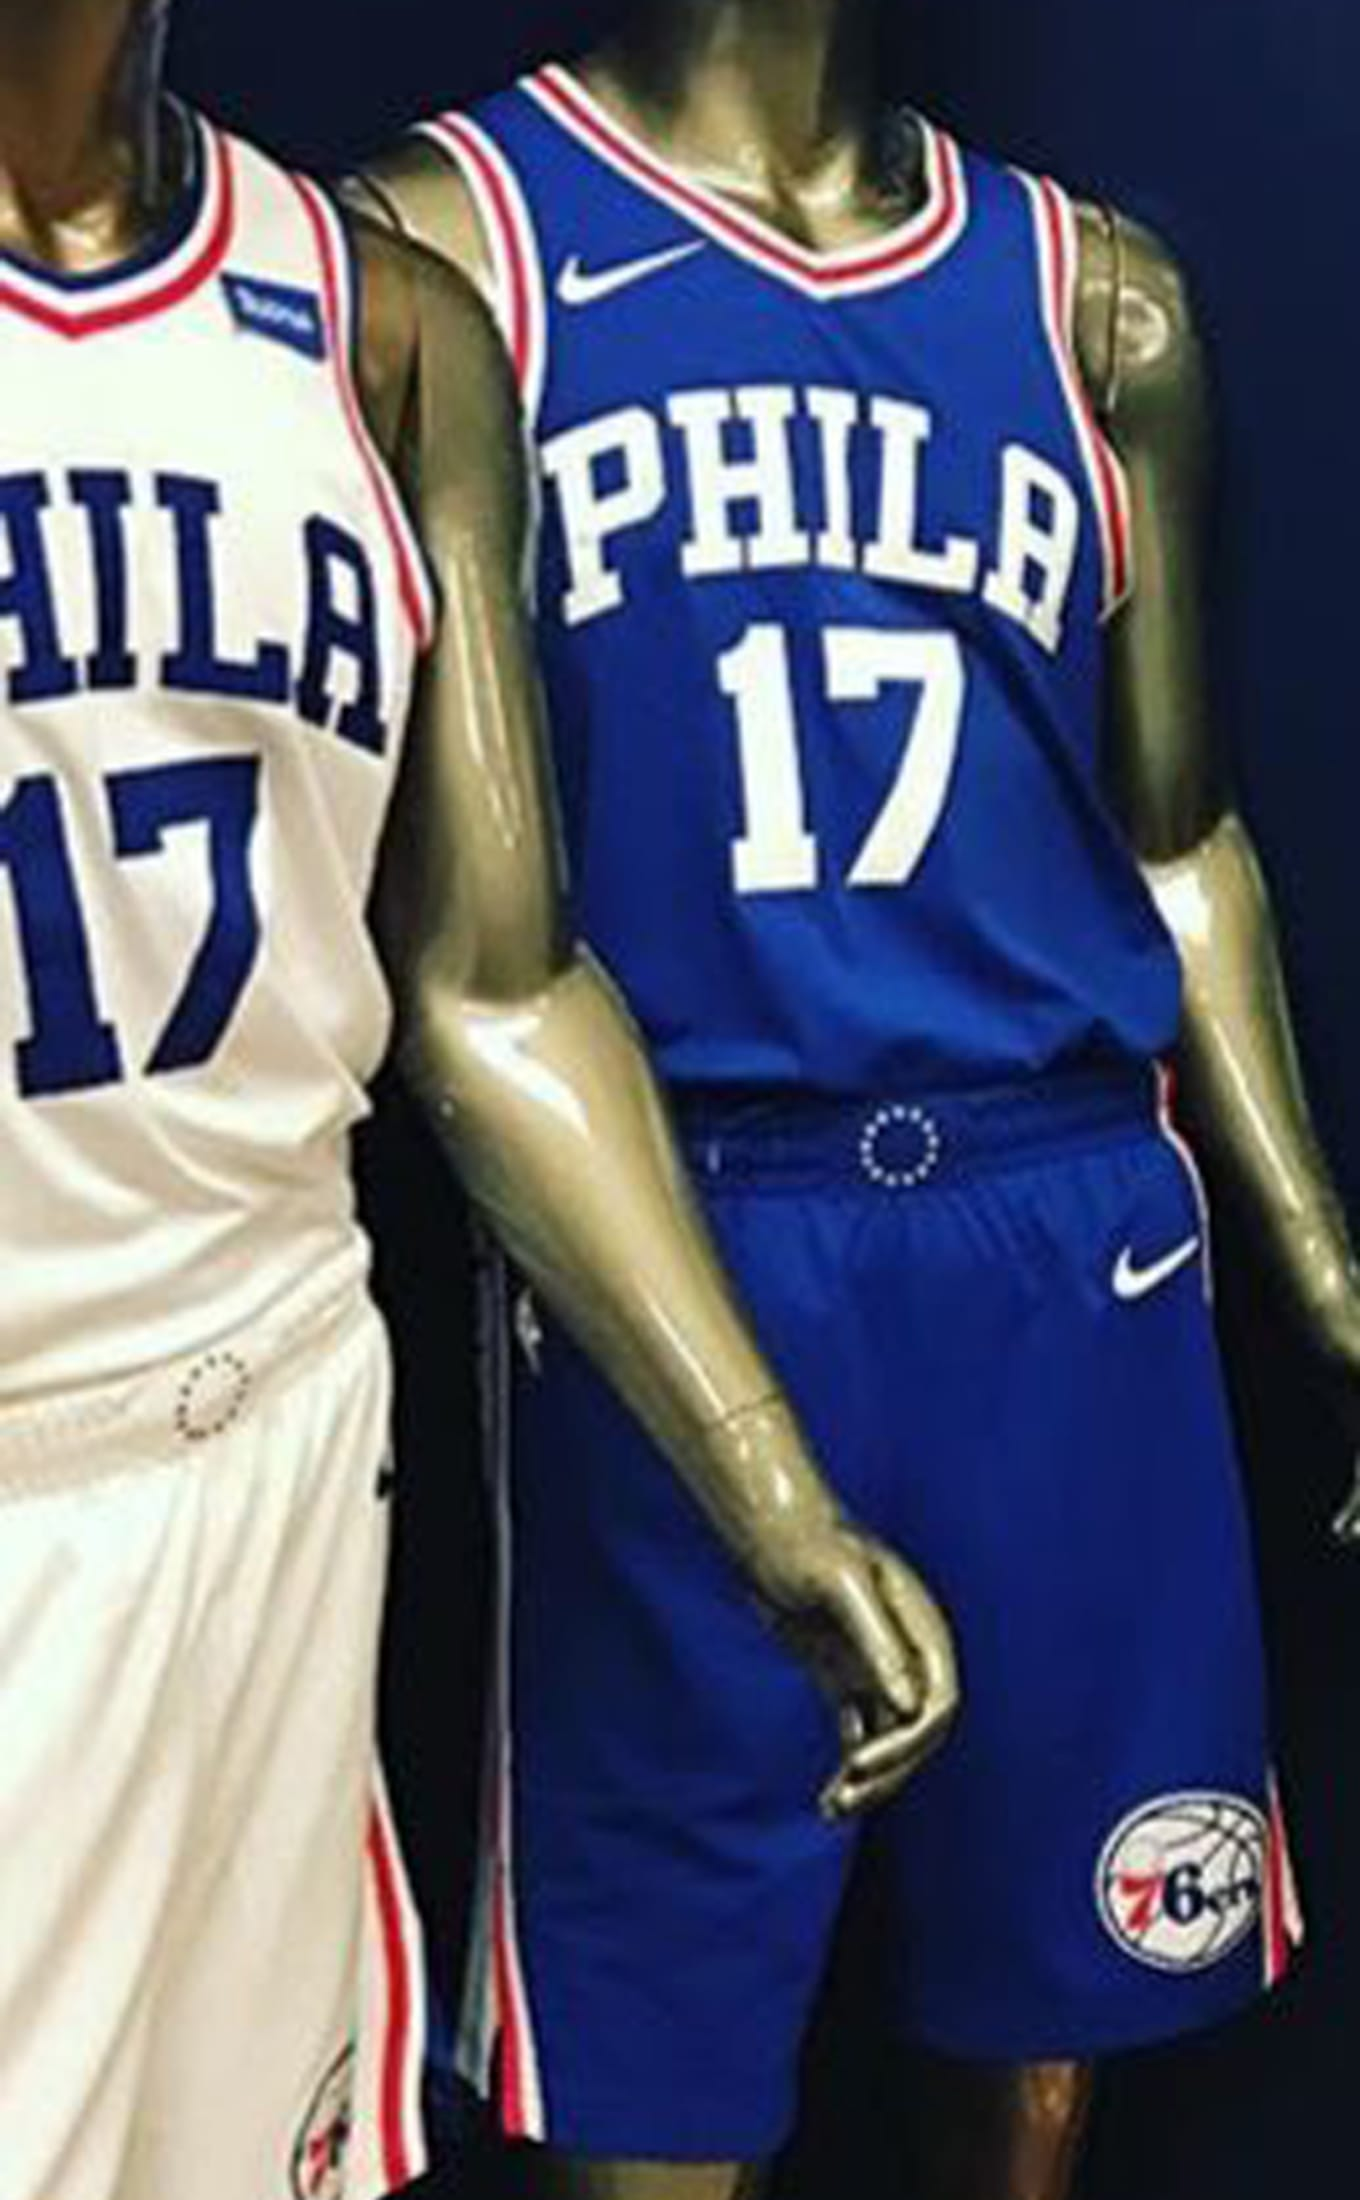 a549611d12a Nike NBA Jerseys 2017 Philadelphia 76ers